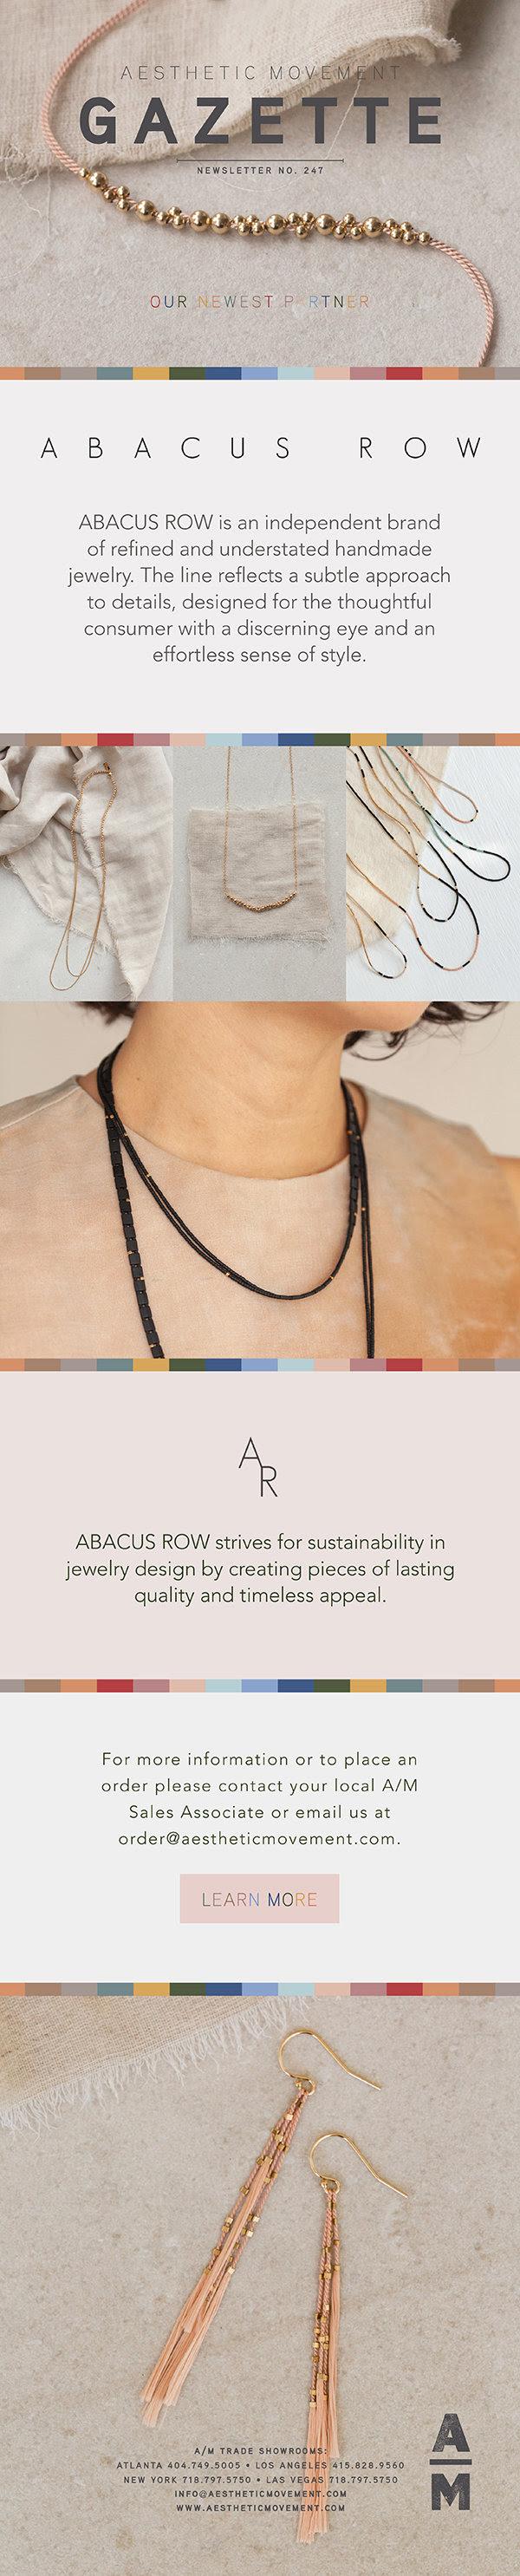 AbacusRow_Web.jpg